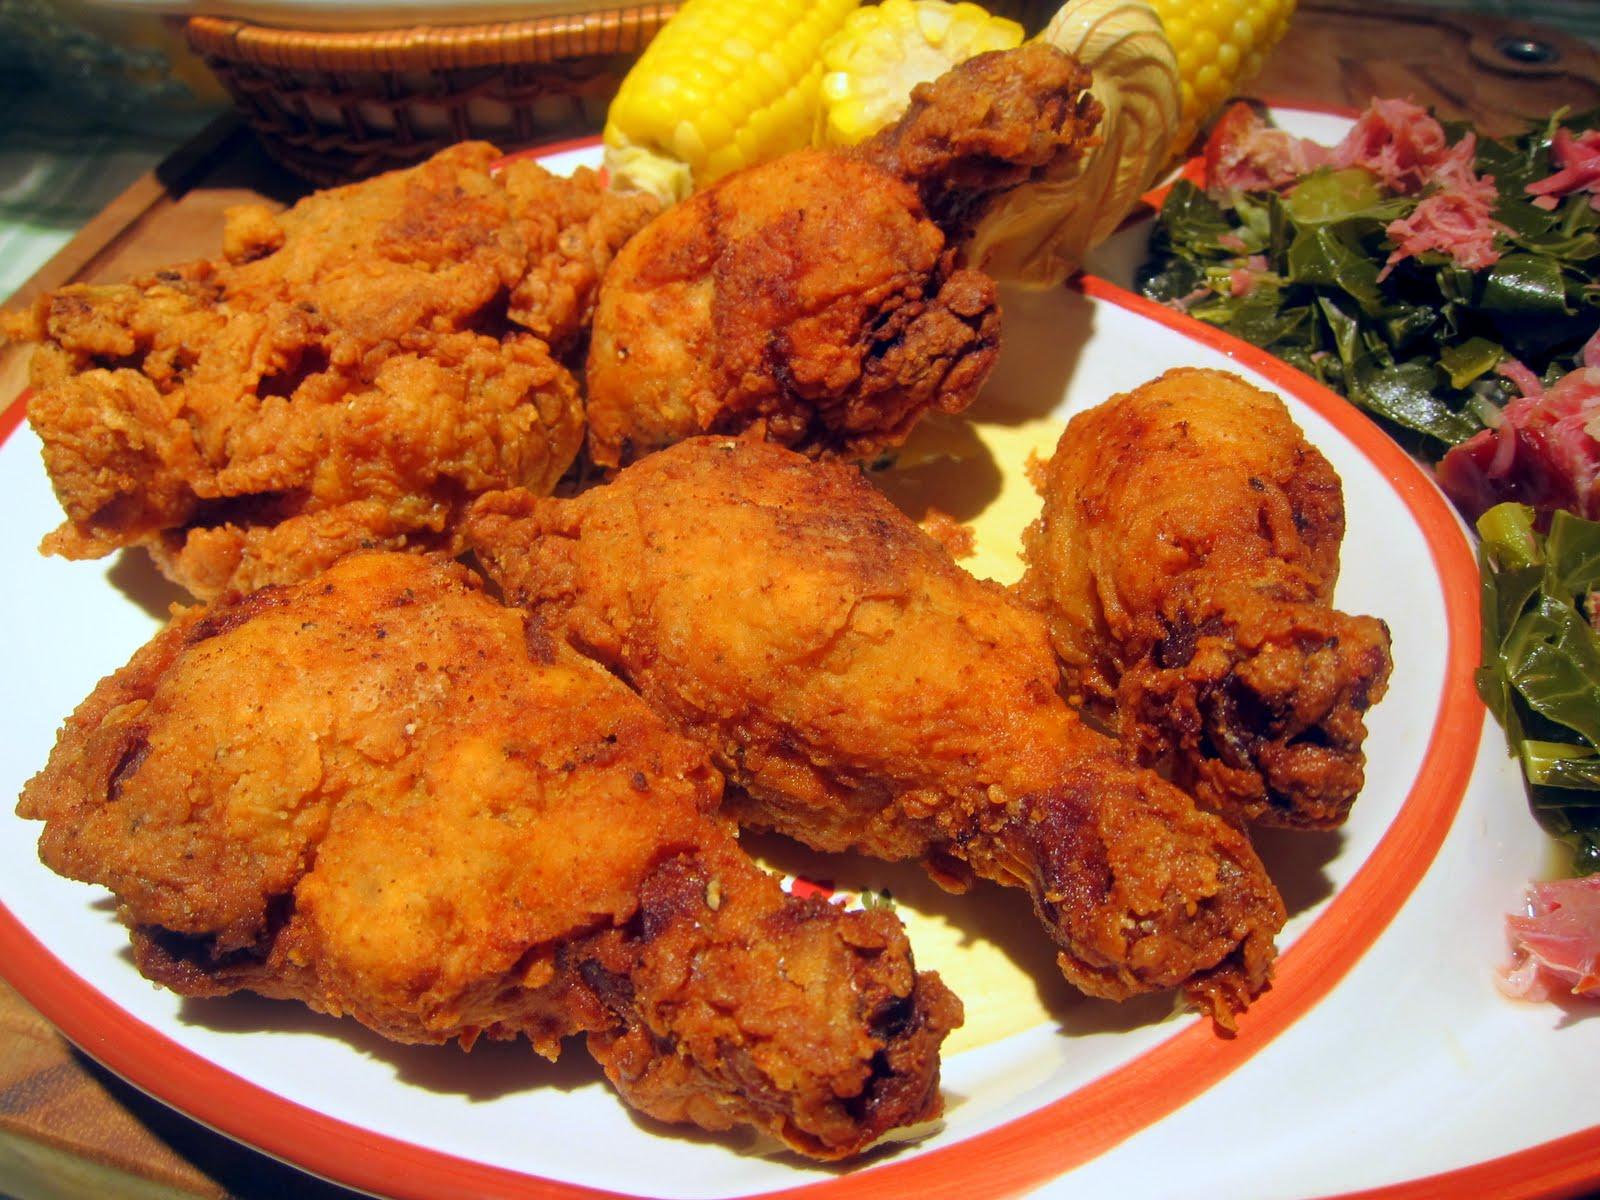 Fried Chicken: Dragon's Kitchen: Southern Fried Chicken